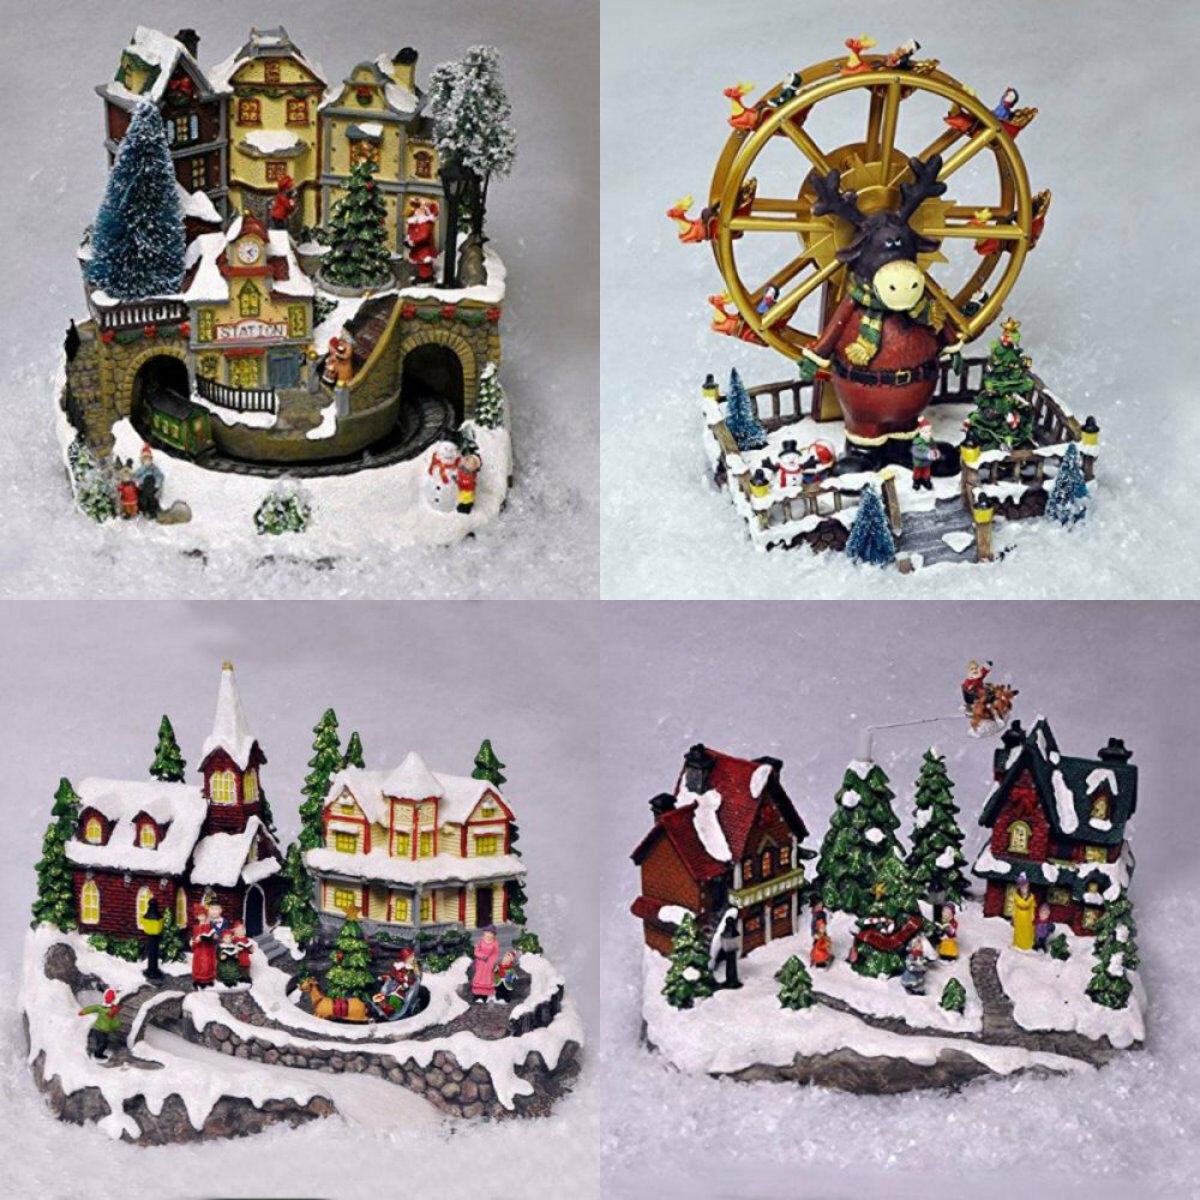 #6D392B Miniature Christmas Village Nativity Scene Ornaments  6125 decoration de noel village miniature 1200x1200 px @ aertt.com